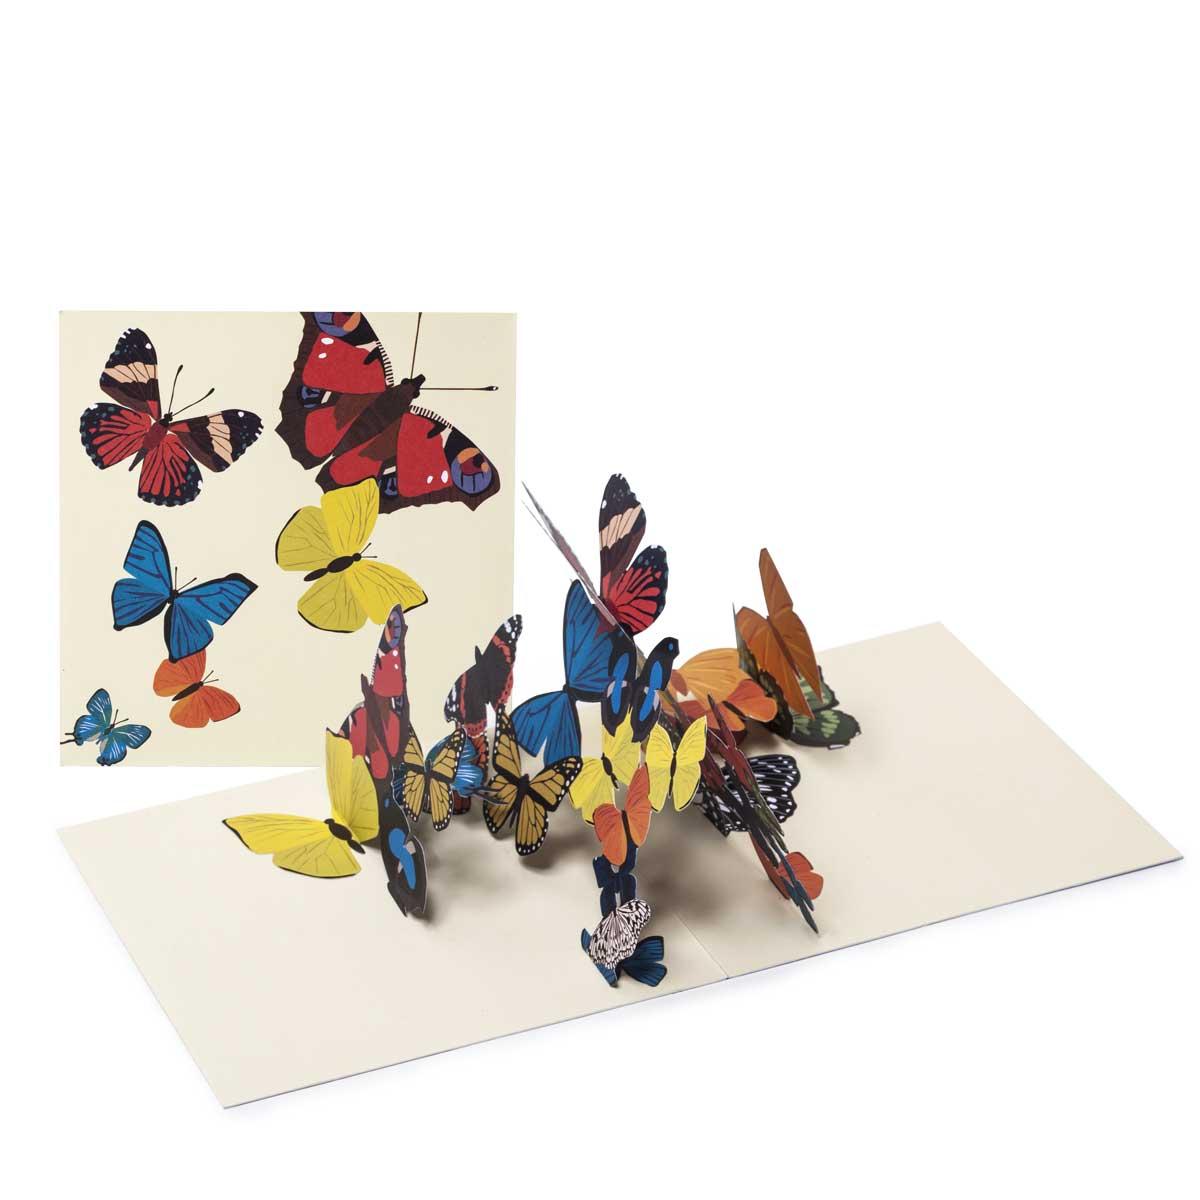 2-to-Tango_Butterfly-Kaleidoscope-Pop-up-card_MaikeBiederstaedt.jpg